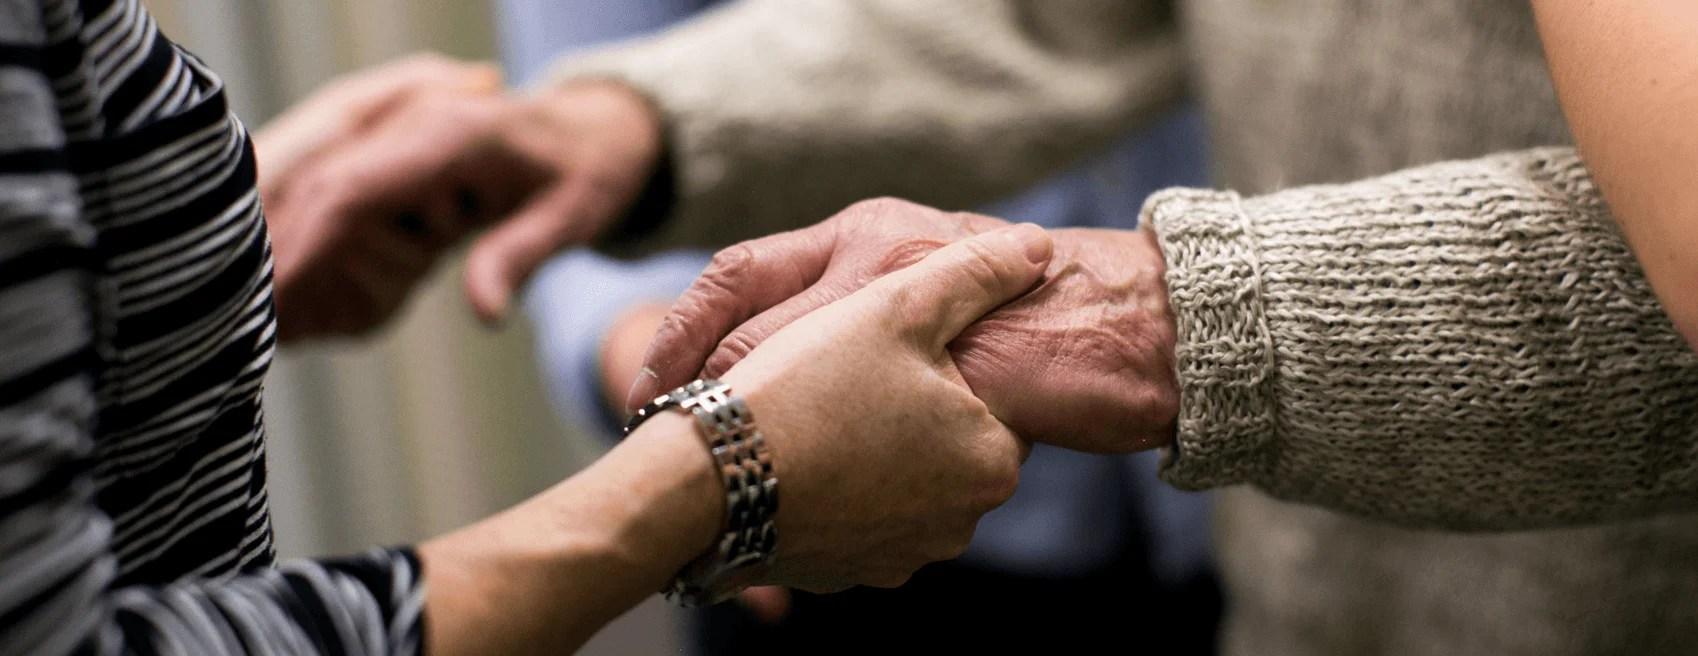 Image result for alzheimer's parkinson's dementia